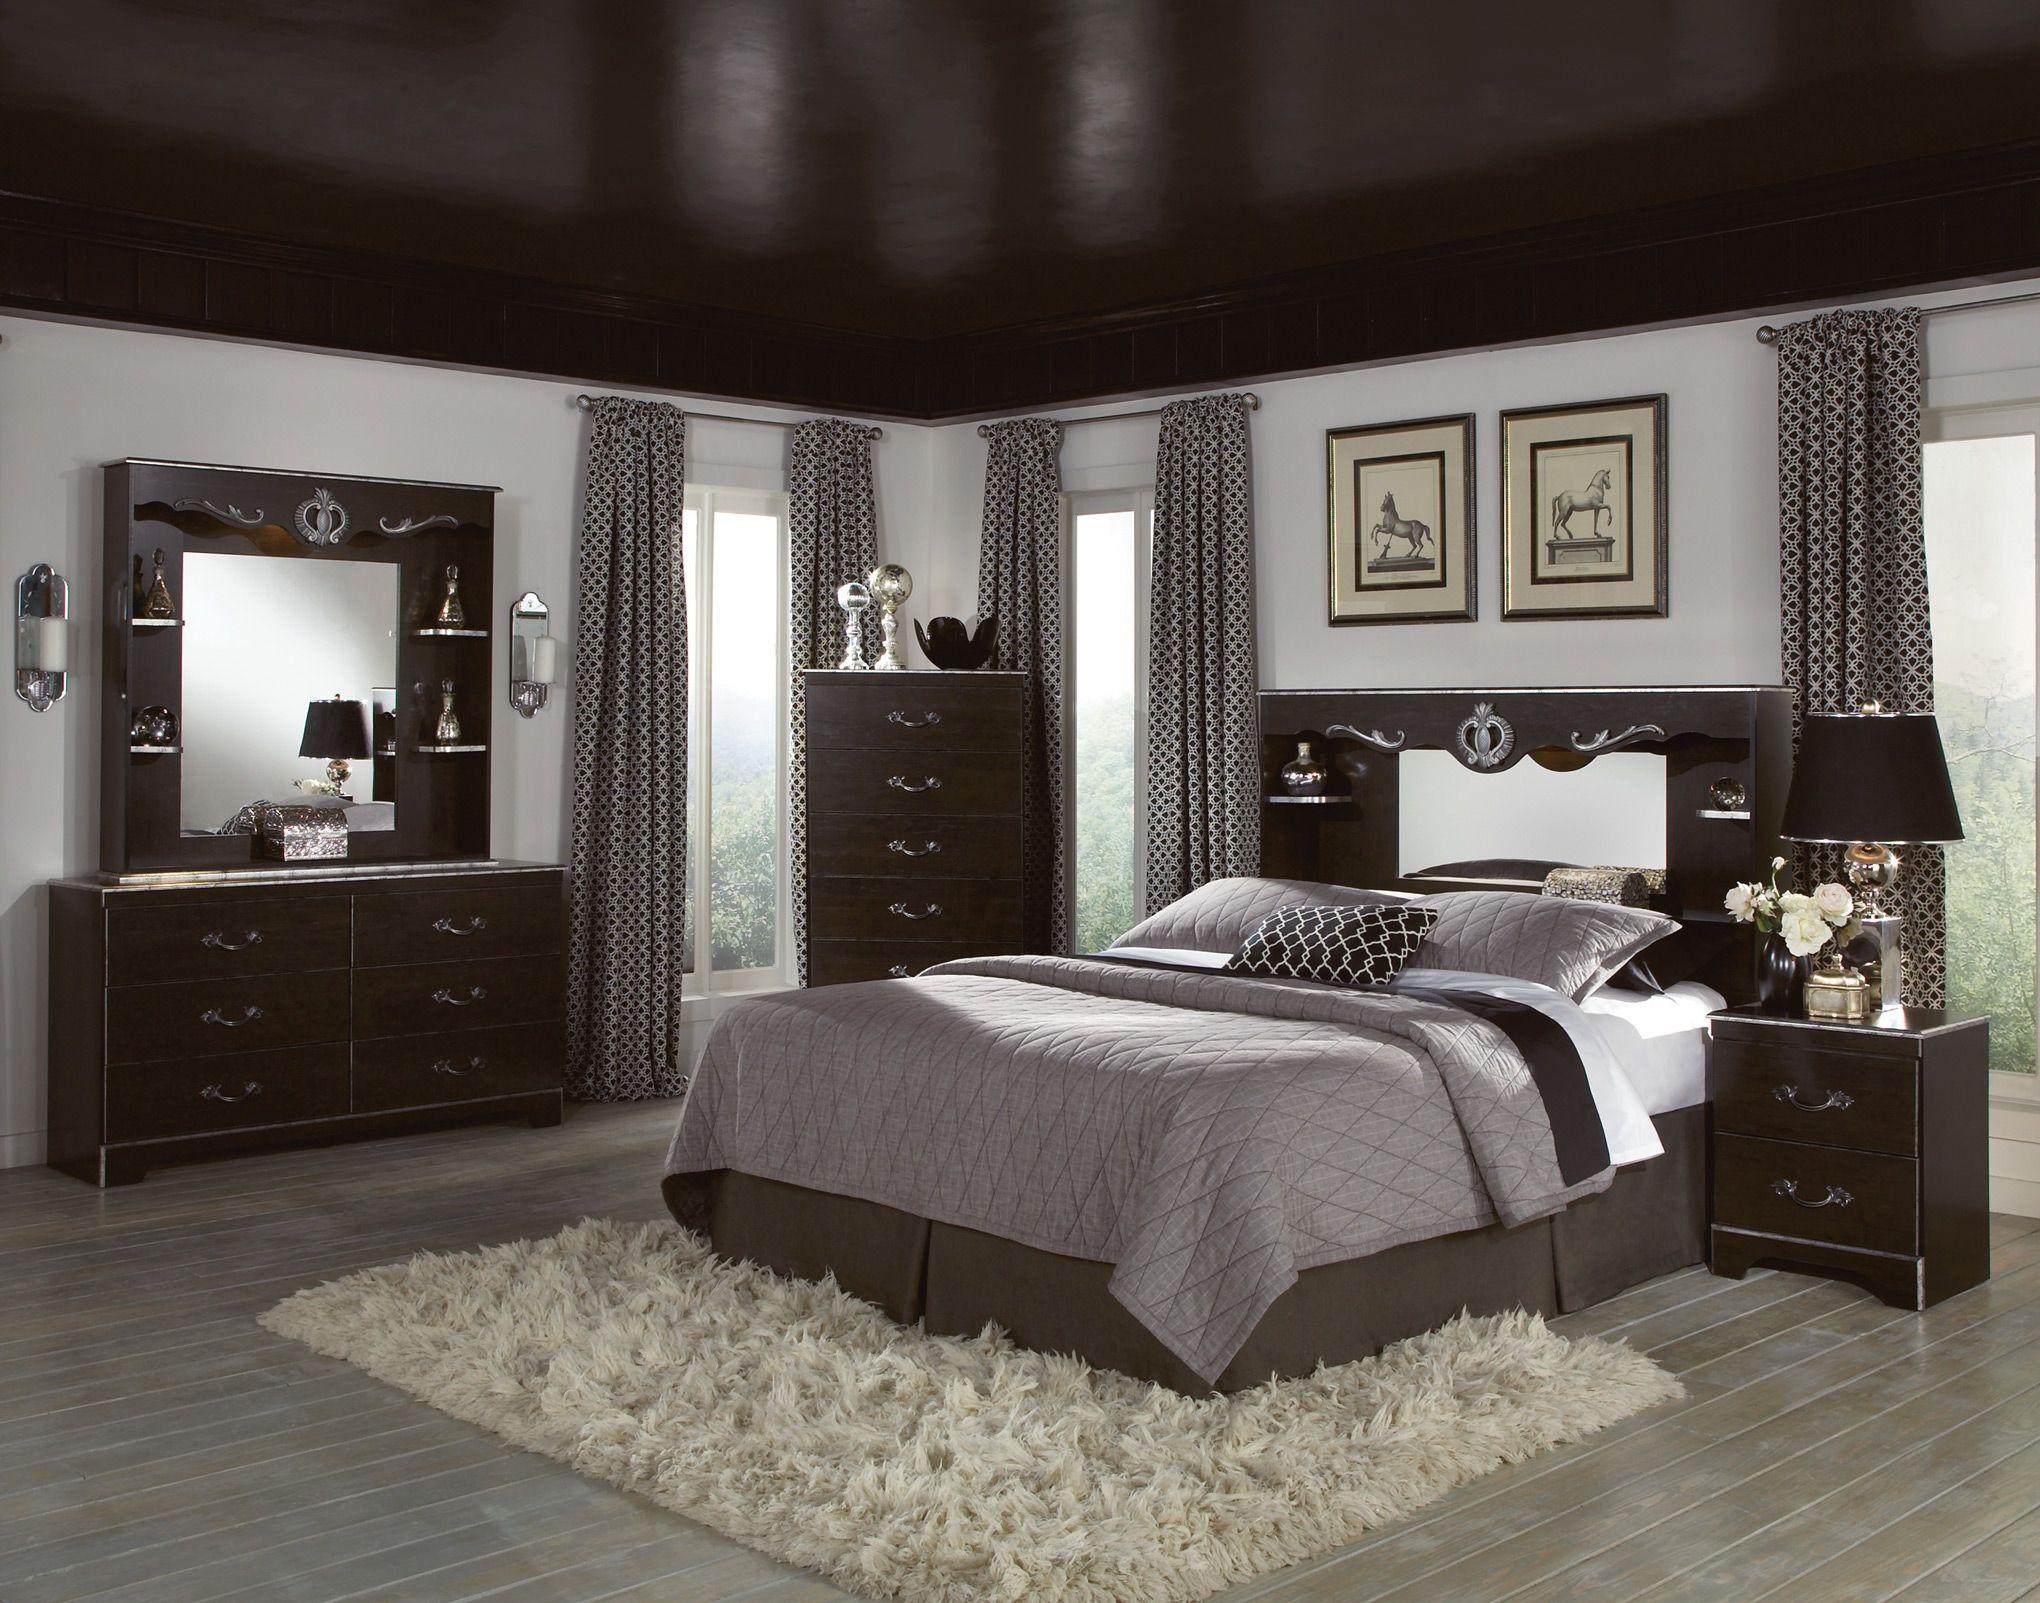 Dark Brown Wood Bedroom Furniture Imagestc Com Gray Master Bedroom Dark Bedroom Furniture Bedroom Colors